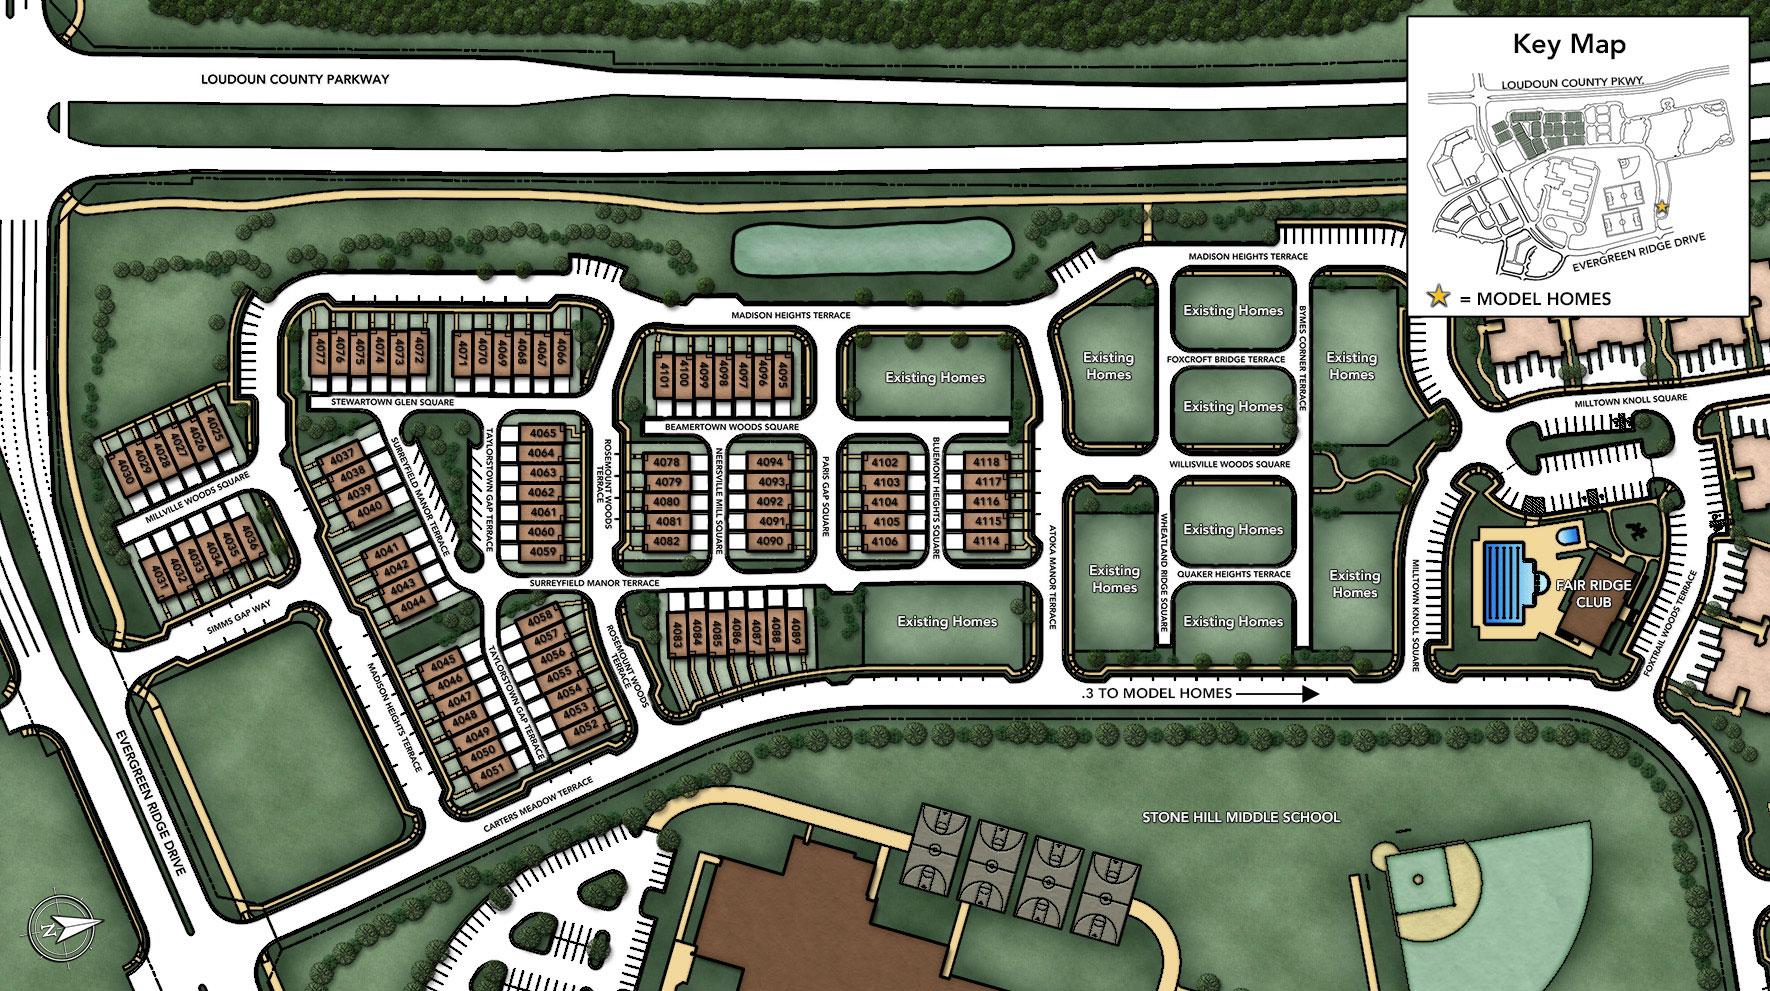 Loudoun Valley - The Fairmont Site Plan II